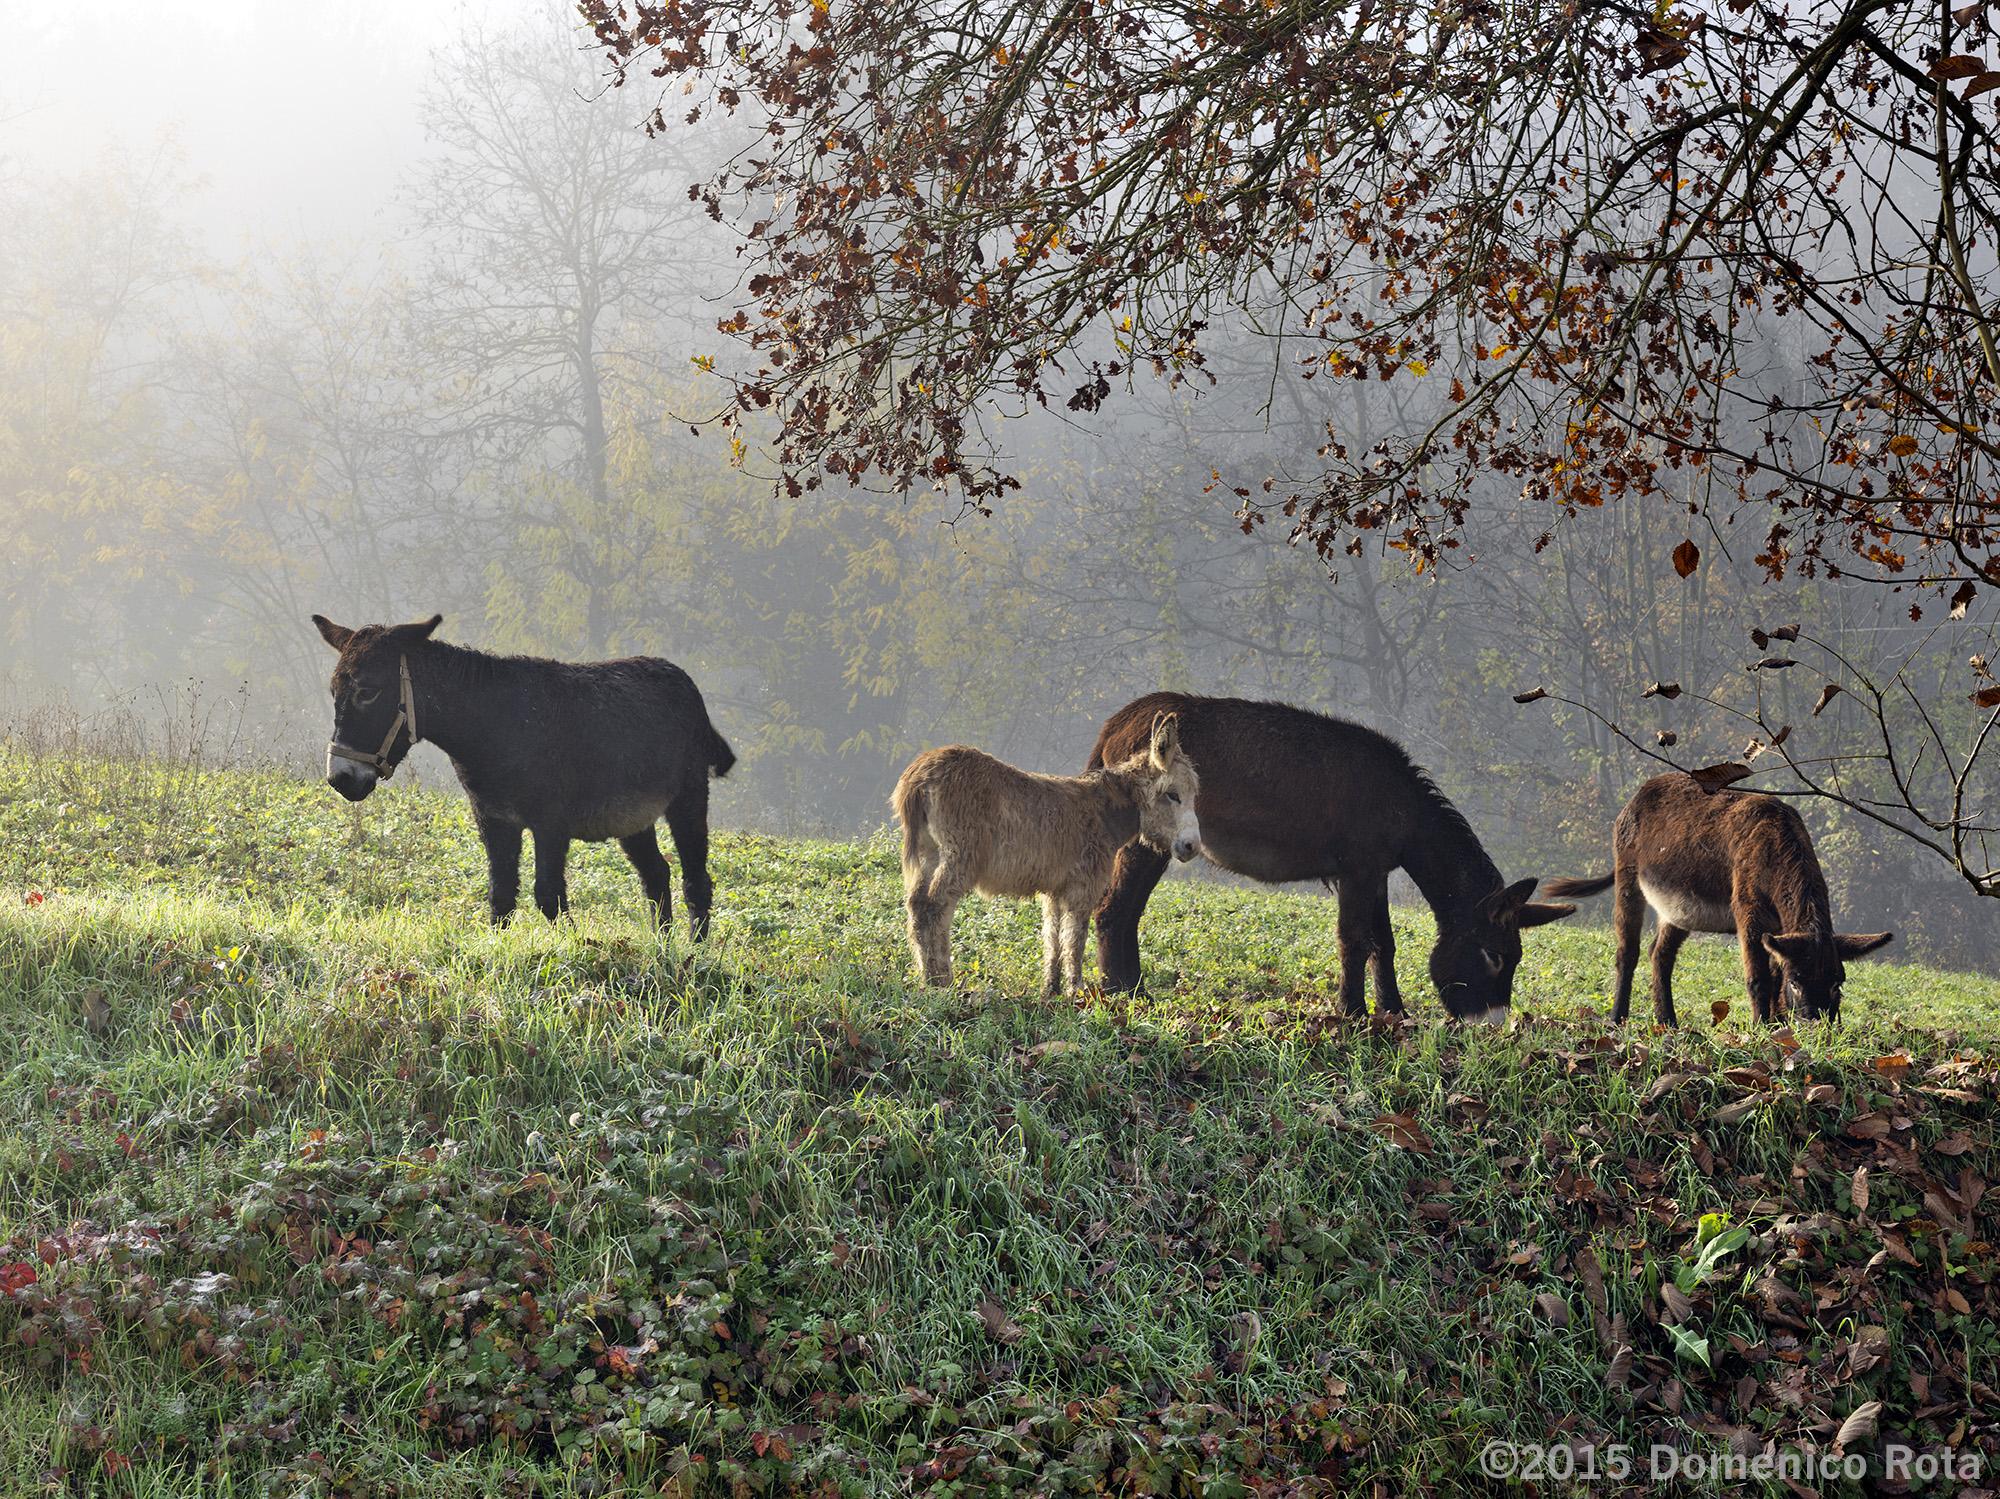 Donkeys in the Fog by modator in Regular Member Gallery